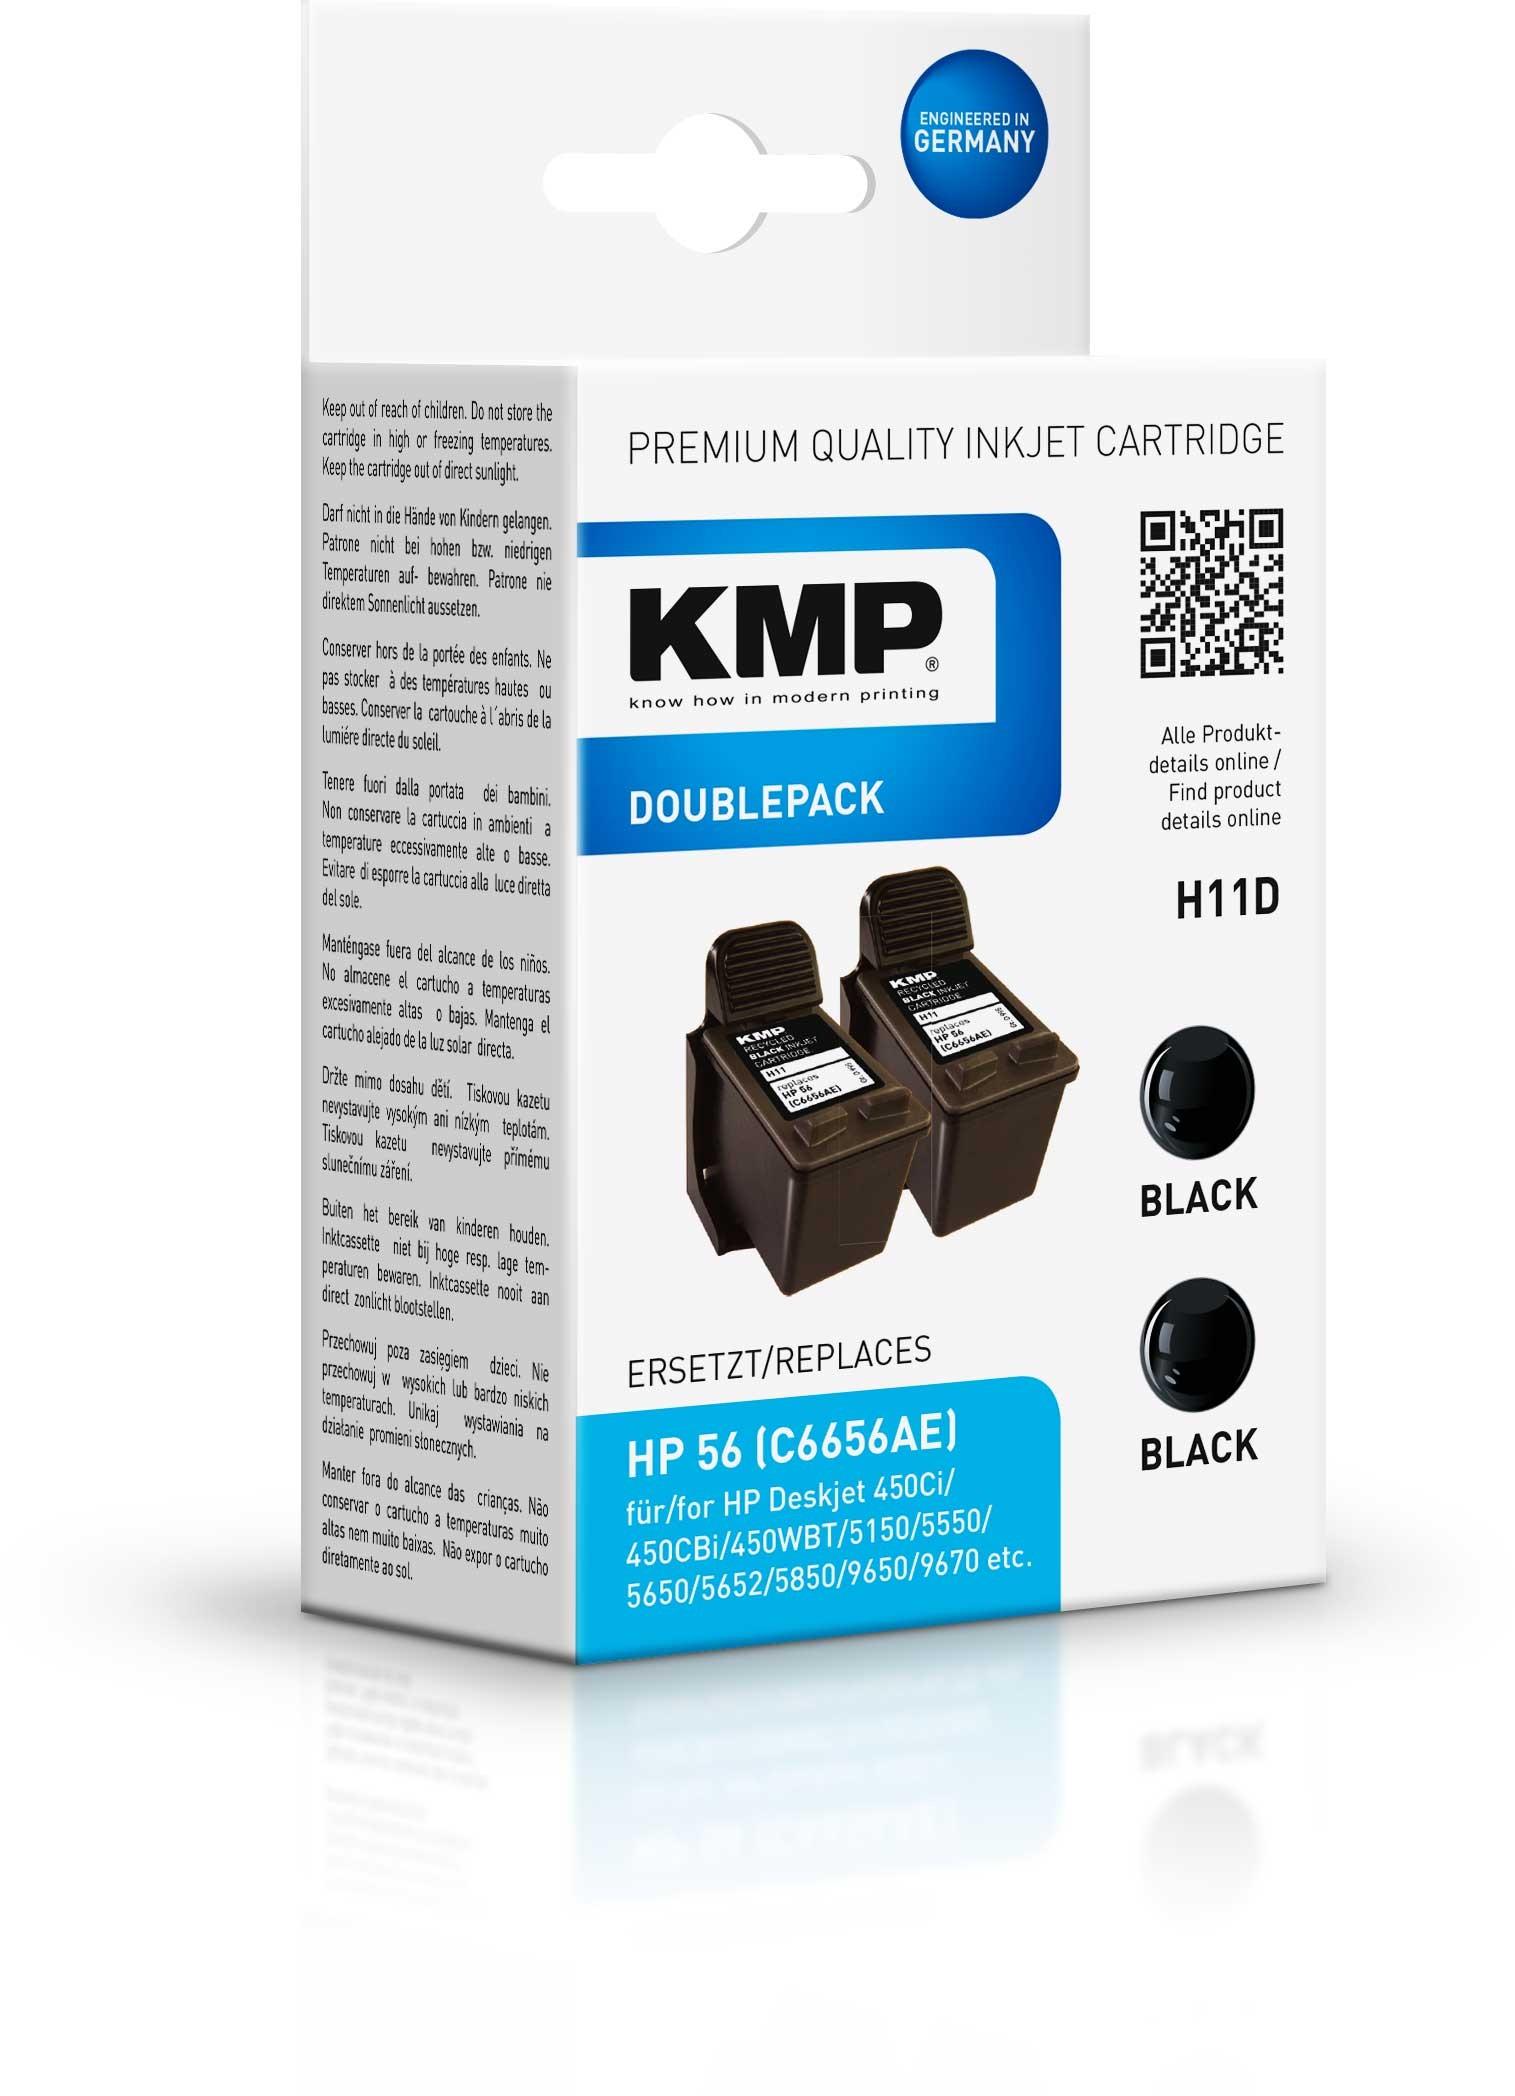 KMP Doppelpack H11D komp. zu HP 56 C6656AE DeskJet 5550 5850 bla